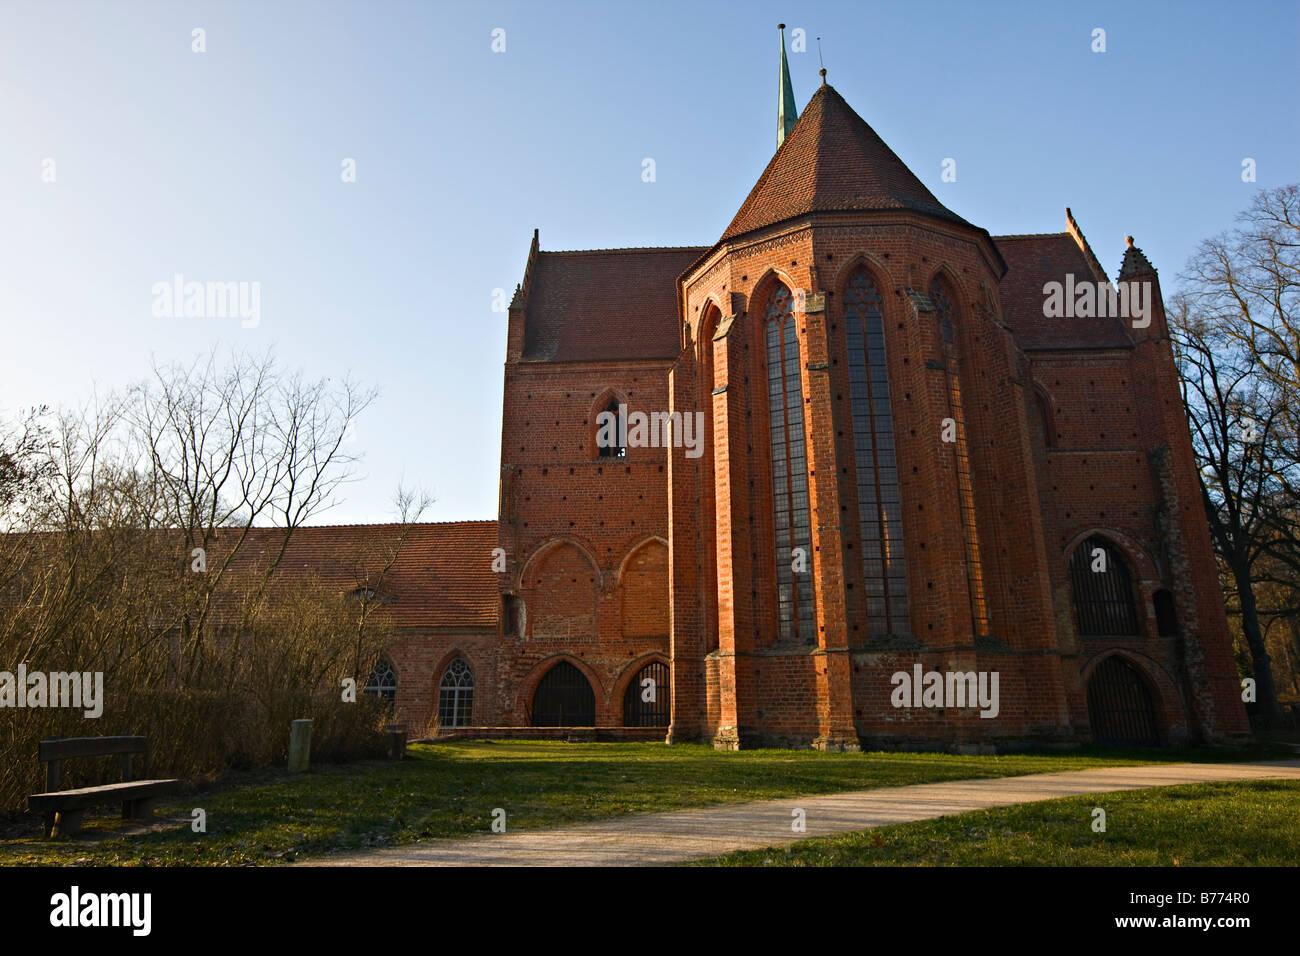 Kloster Chorin (Chorin Monastery), Germany, Europe - Stock Image